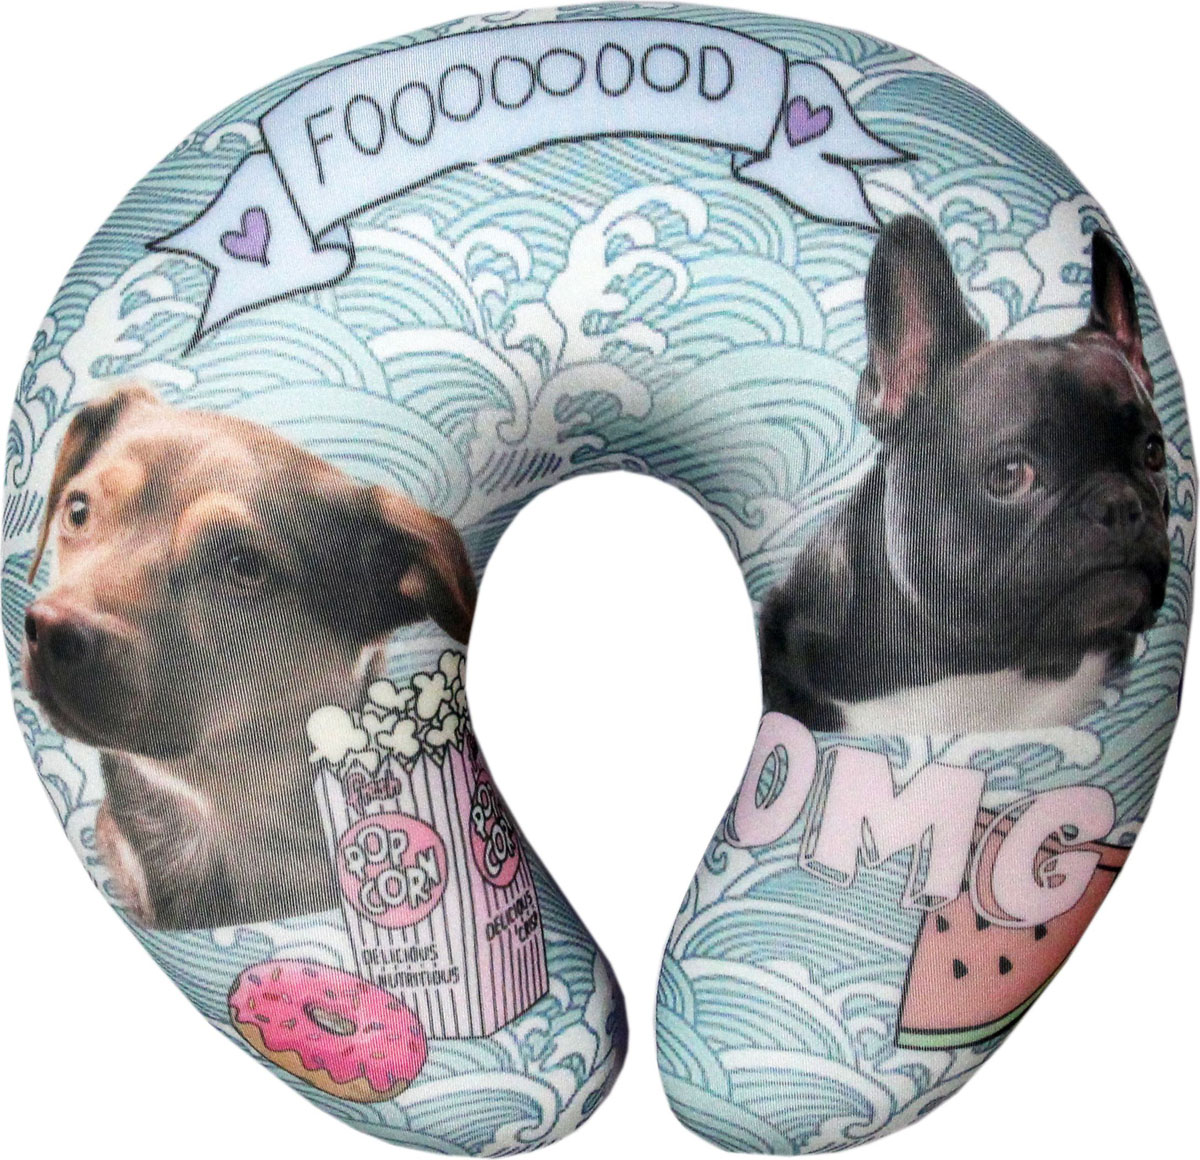 Подушка-антистресс для шеи Собаки пара, цвет: бирюзовый, 30 х 27 см подушка антистресс для шеи армейский 30 х 27 см 16асп32ив 1